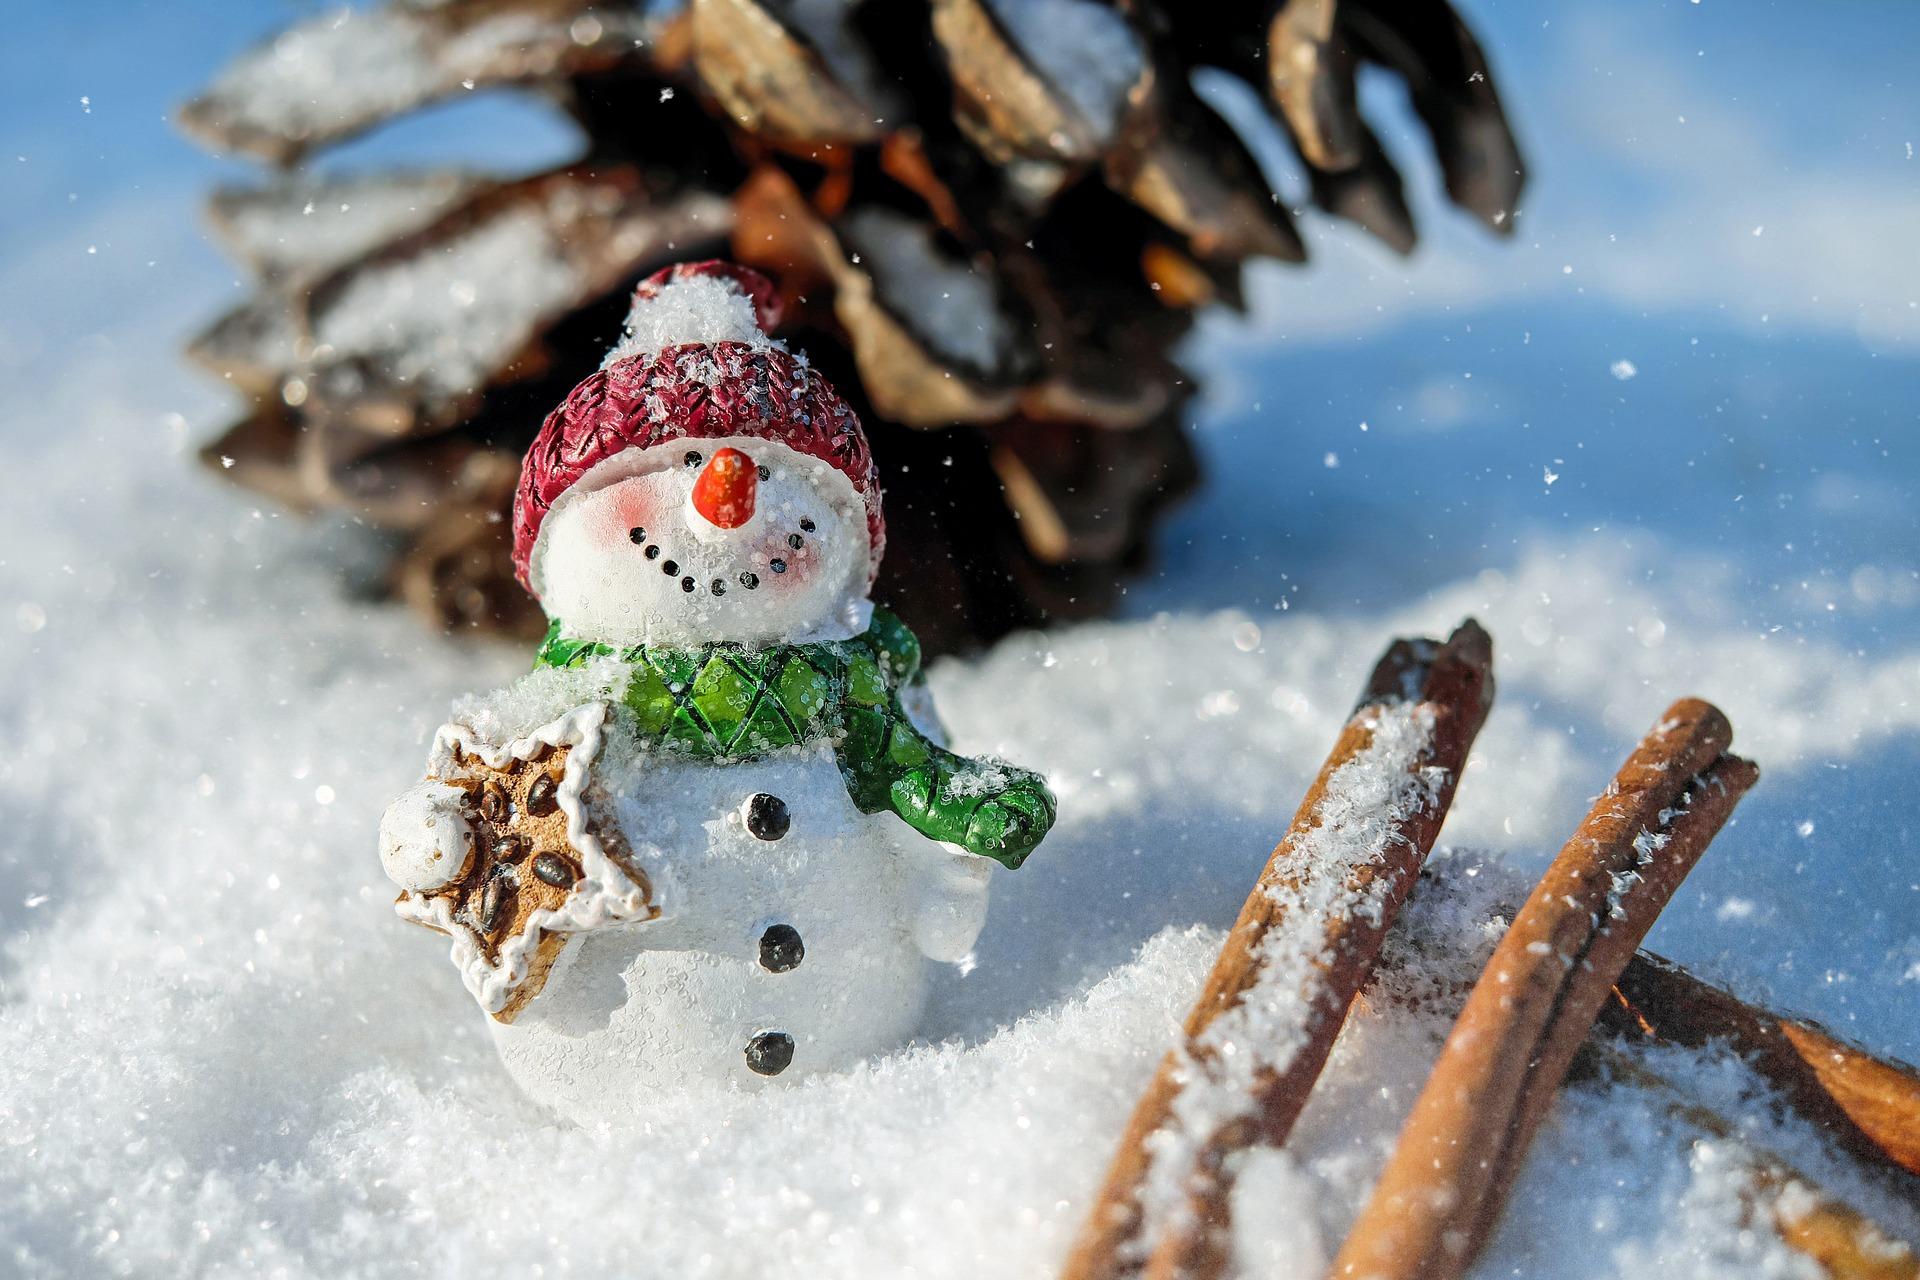 snowman-1882635_1920.jpg